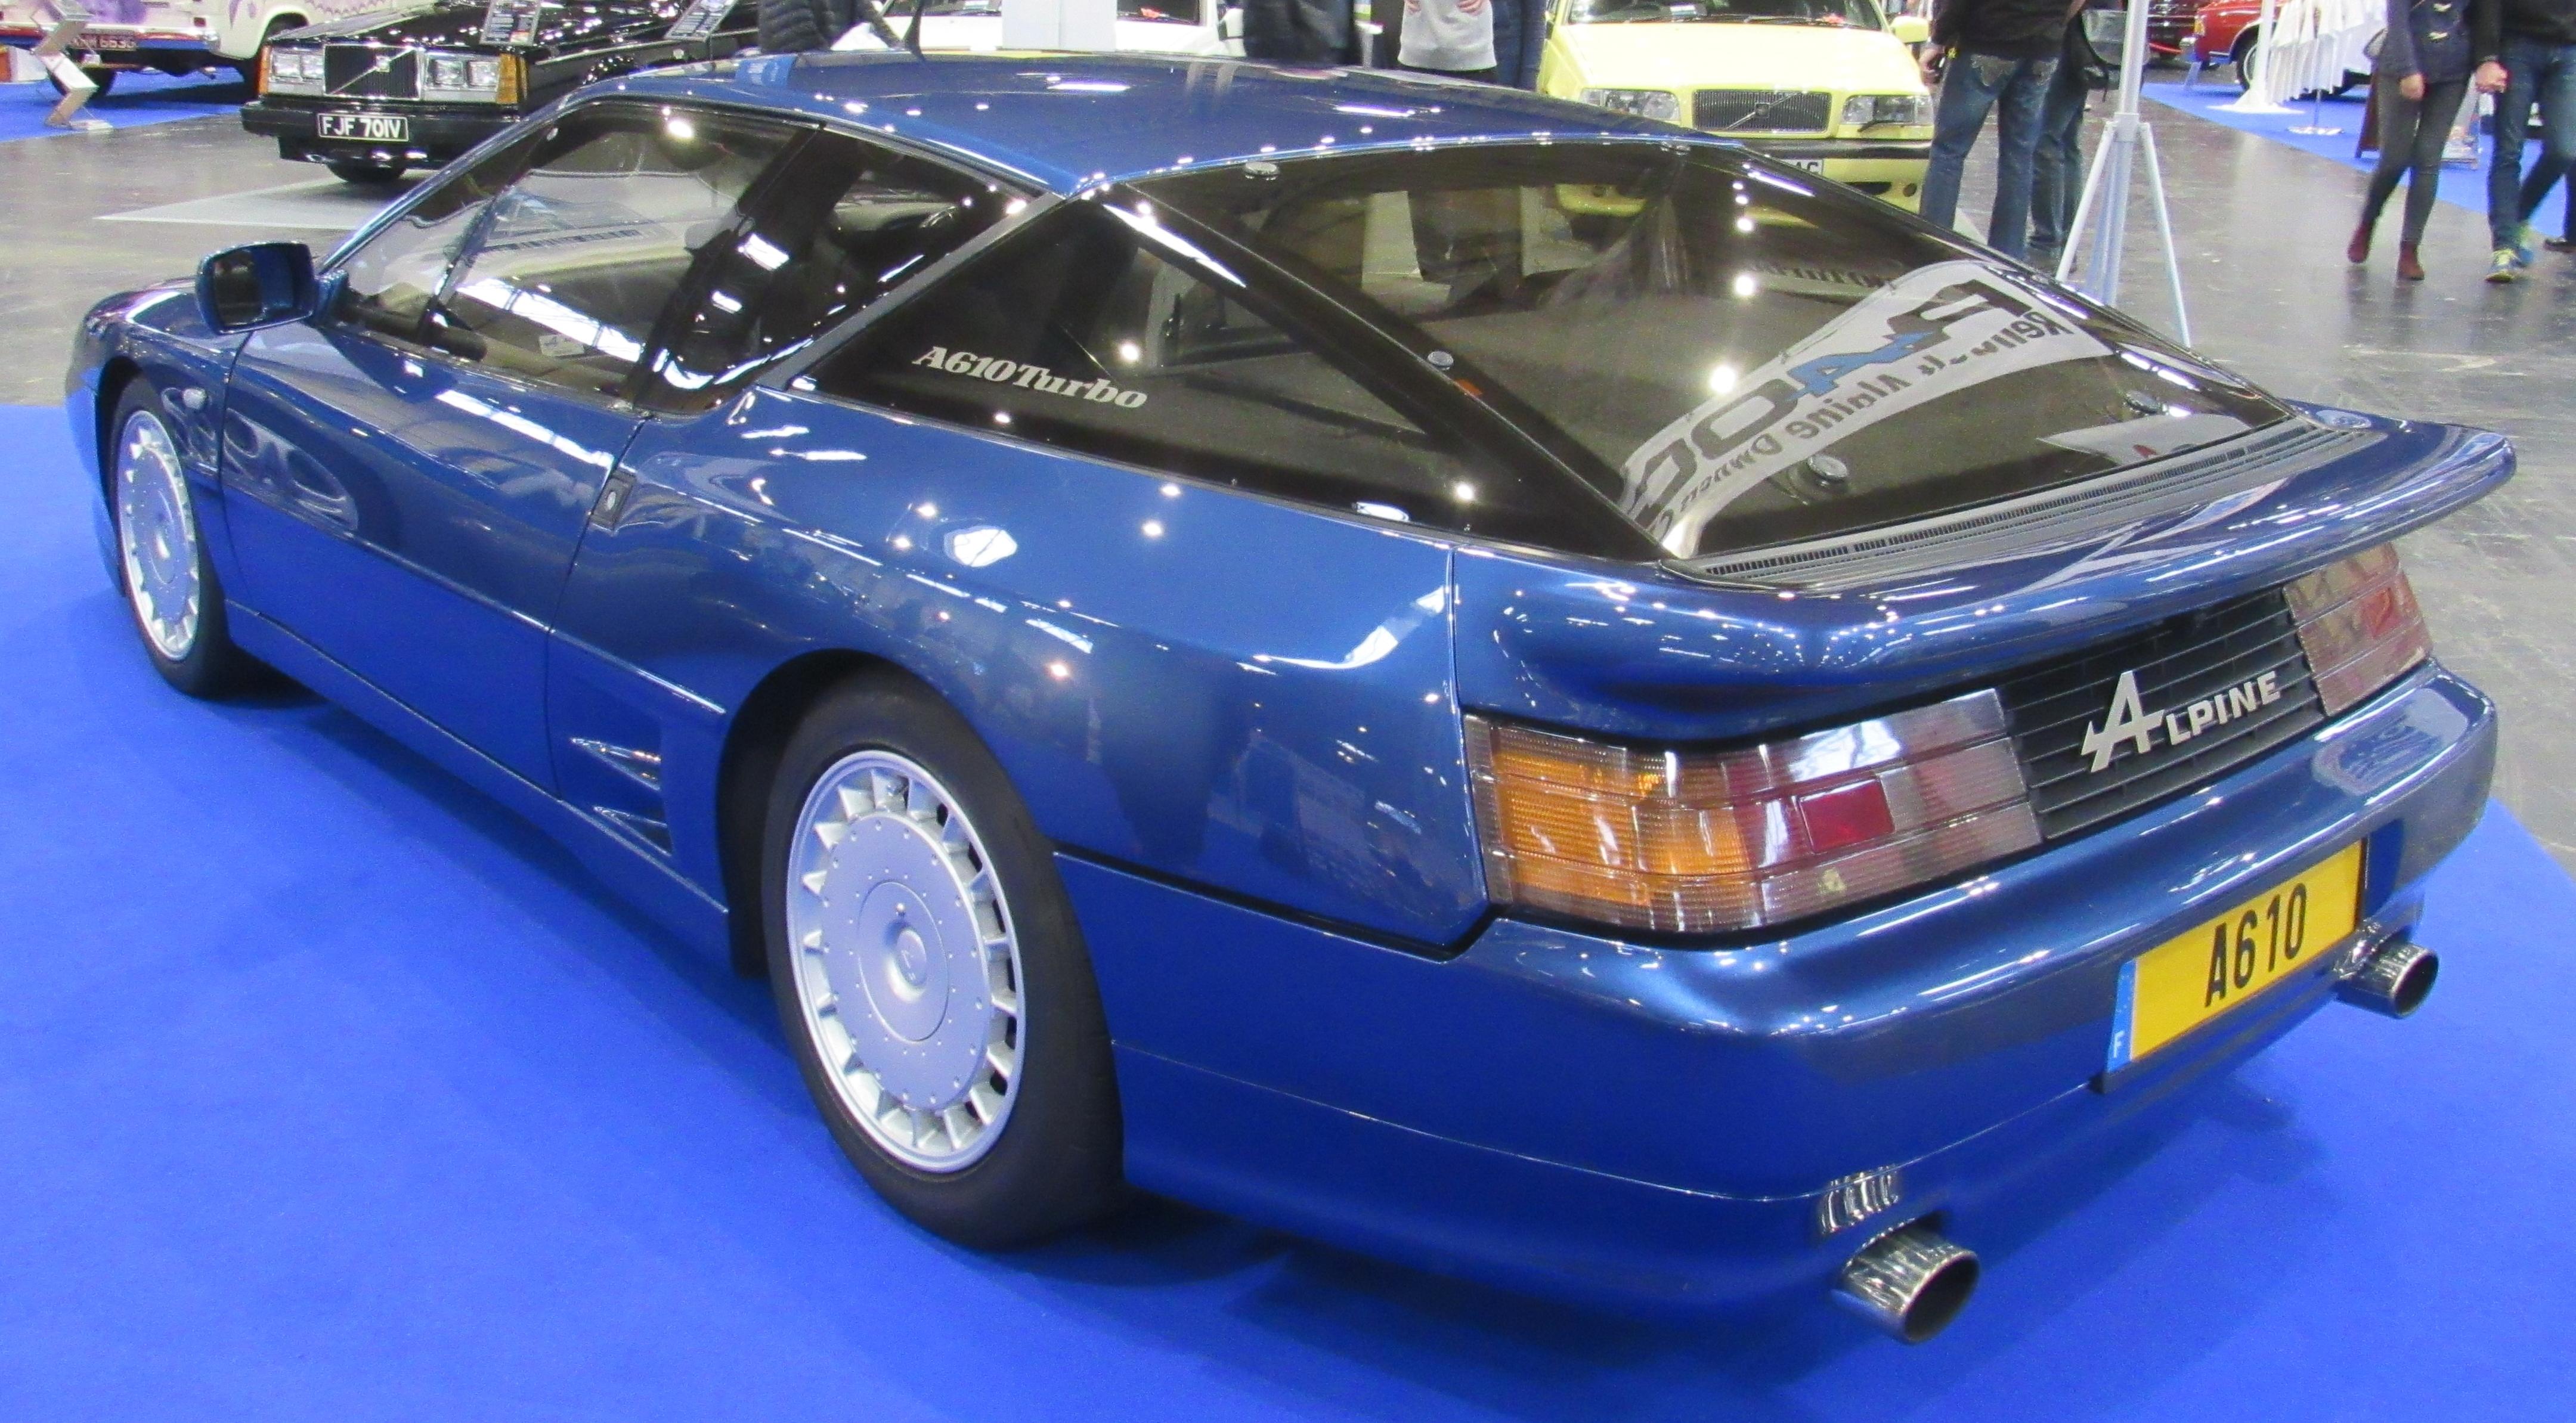 Renault Alpine GTA/A610 - Wikipedia